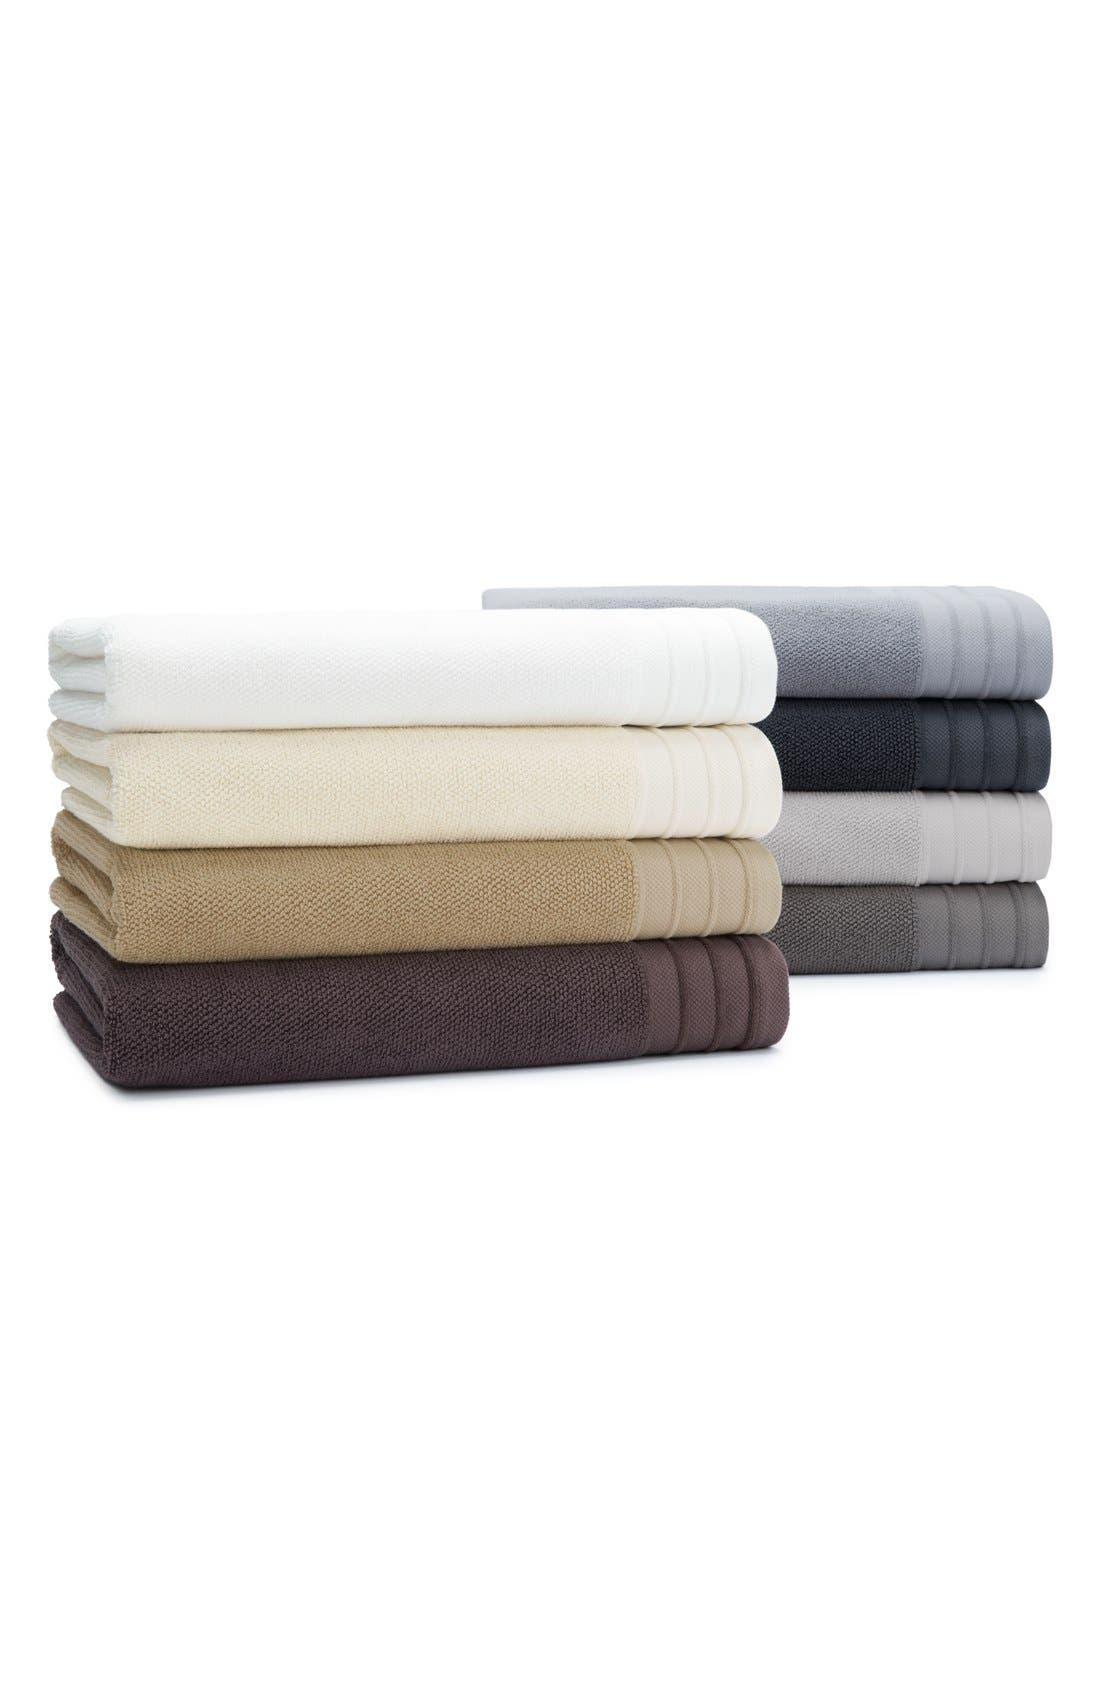 Alternate Image 3  - UGG® Classic Luxe Cotton Bath Sheet